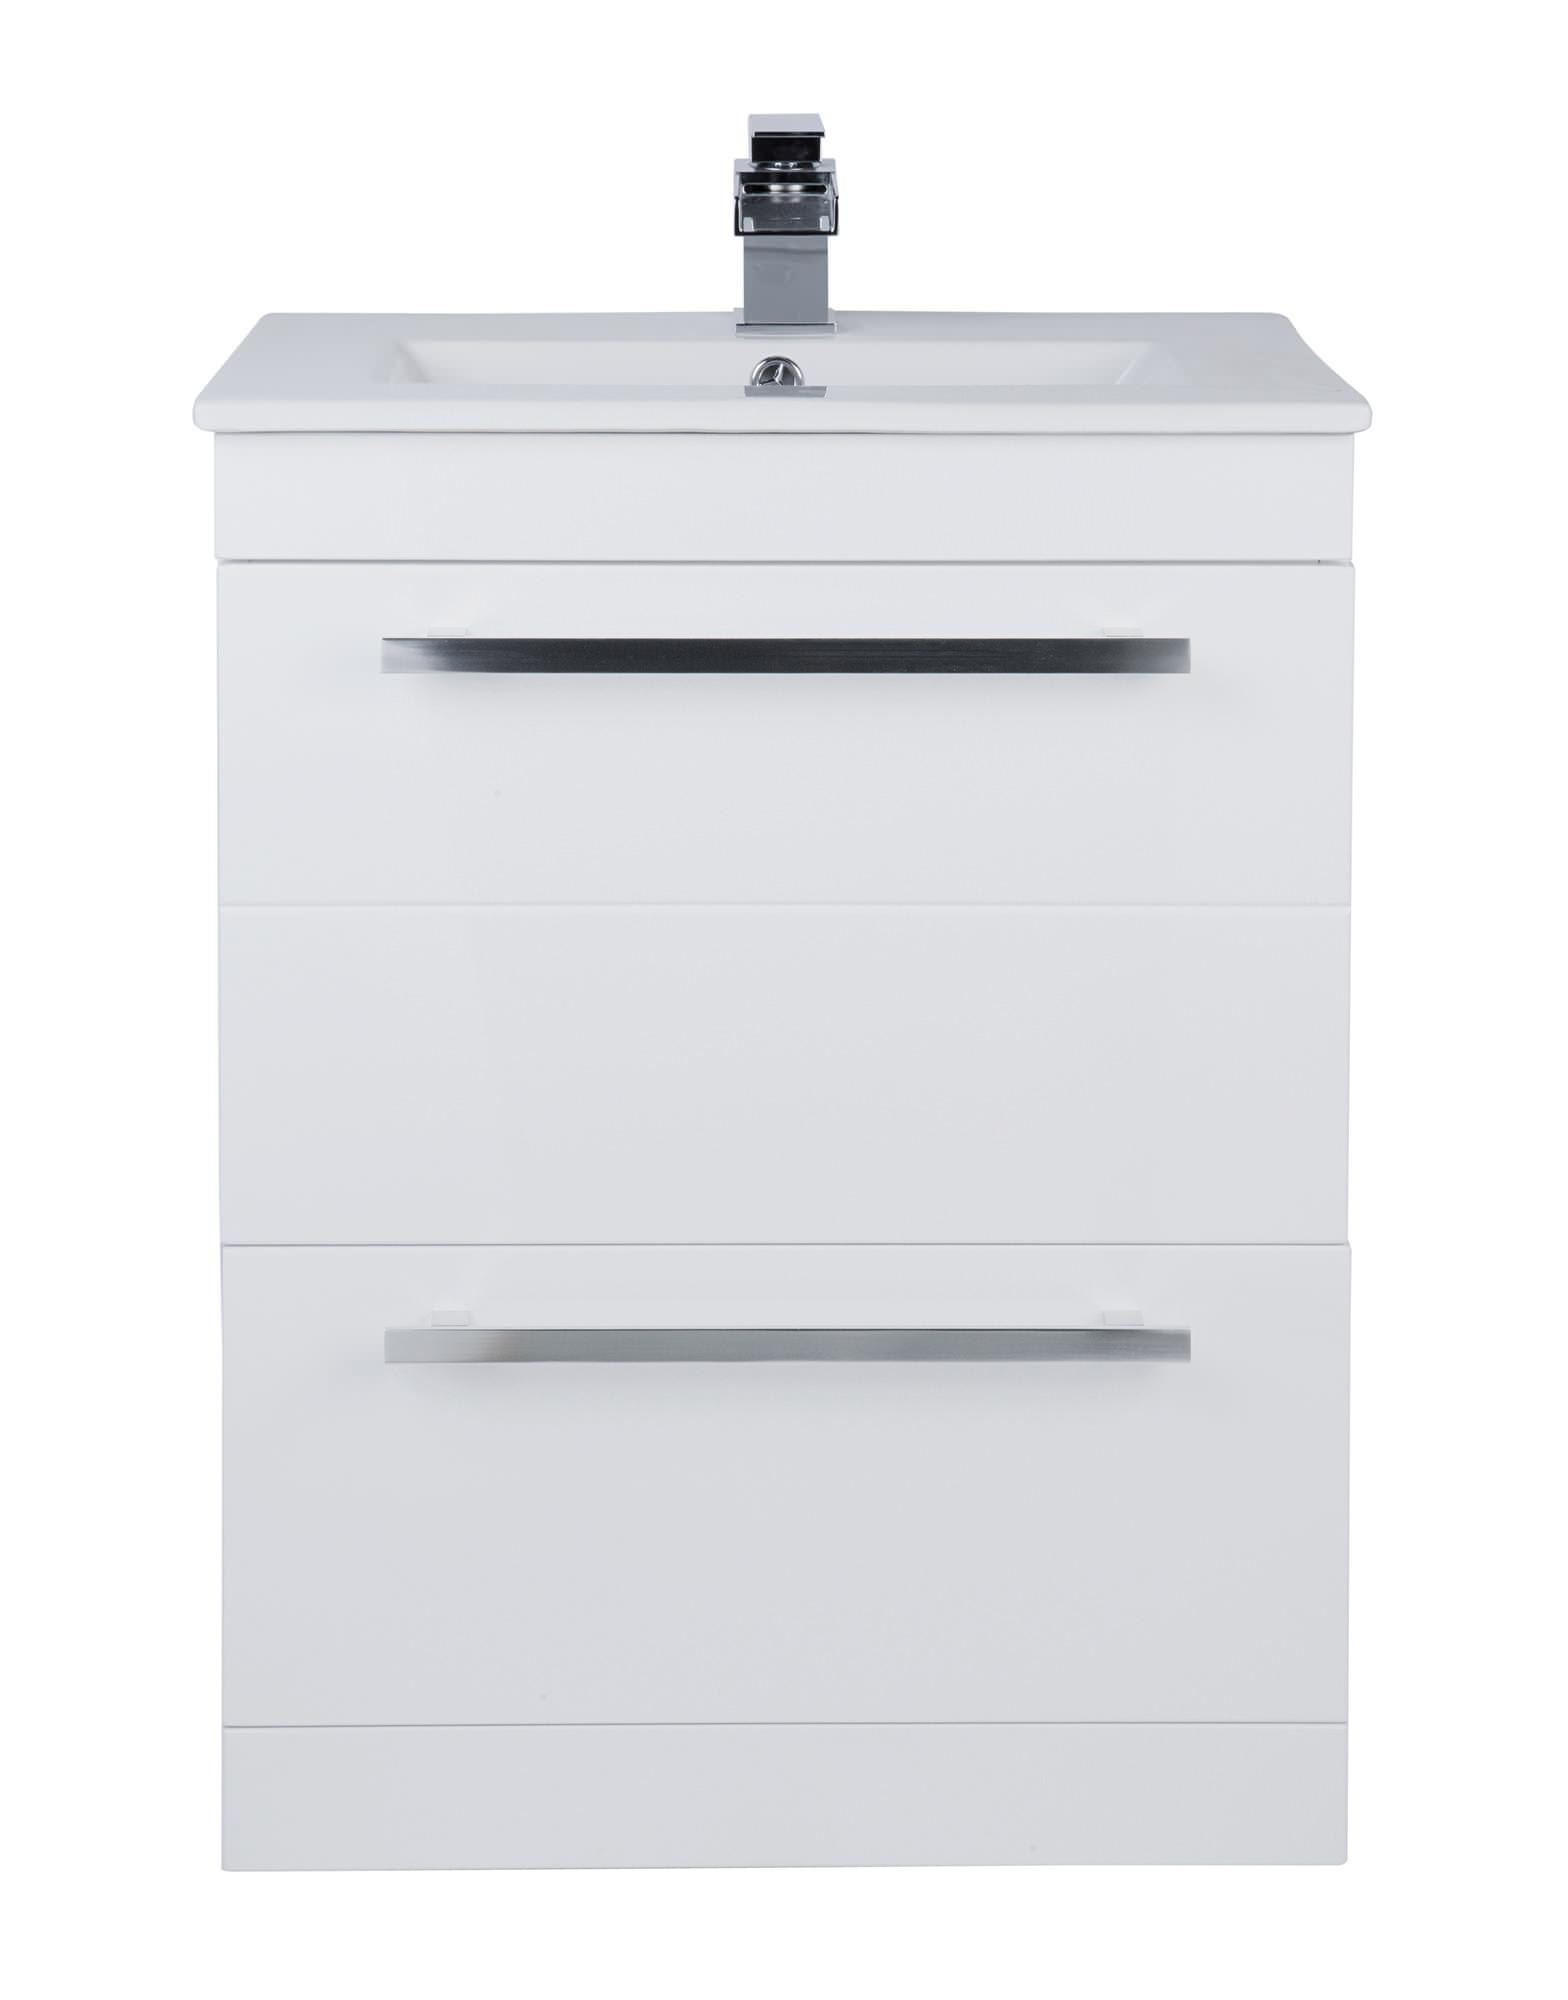 Beo Bathroom Furniture   Cabinets & Mirrors - QS Supplies